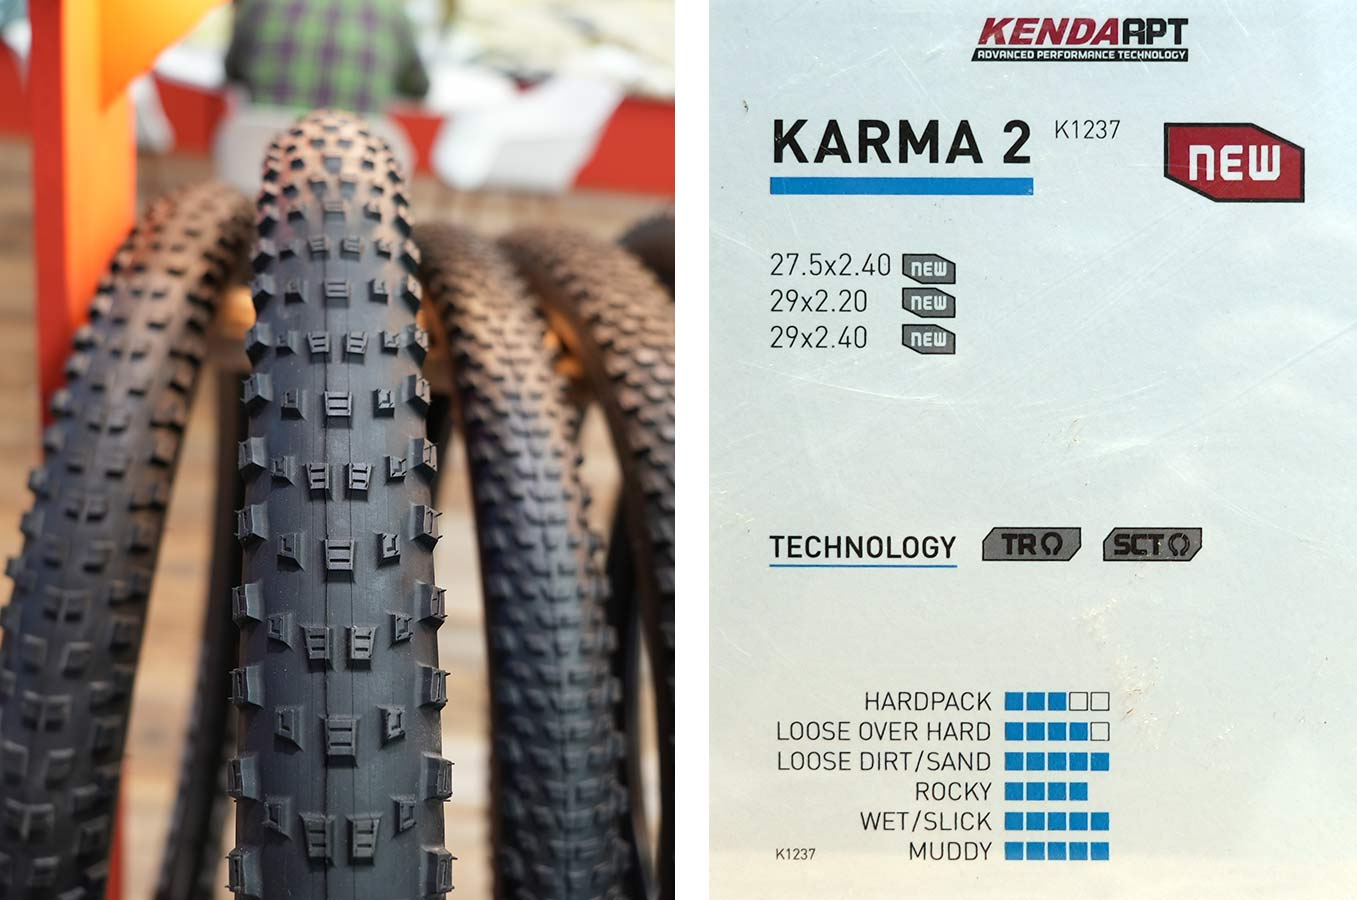 new kenda karma 2 mountain bike tire tread pattern detail